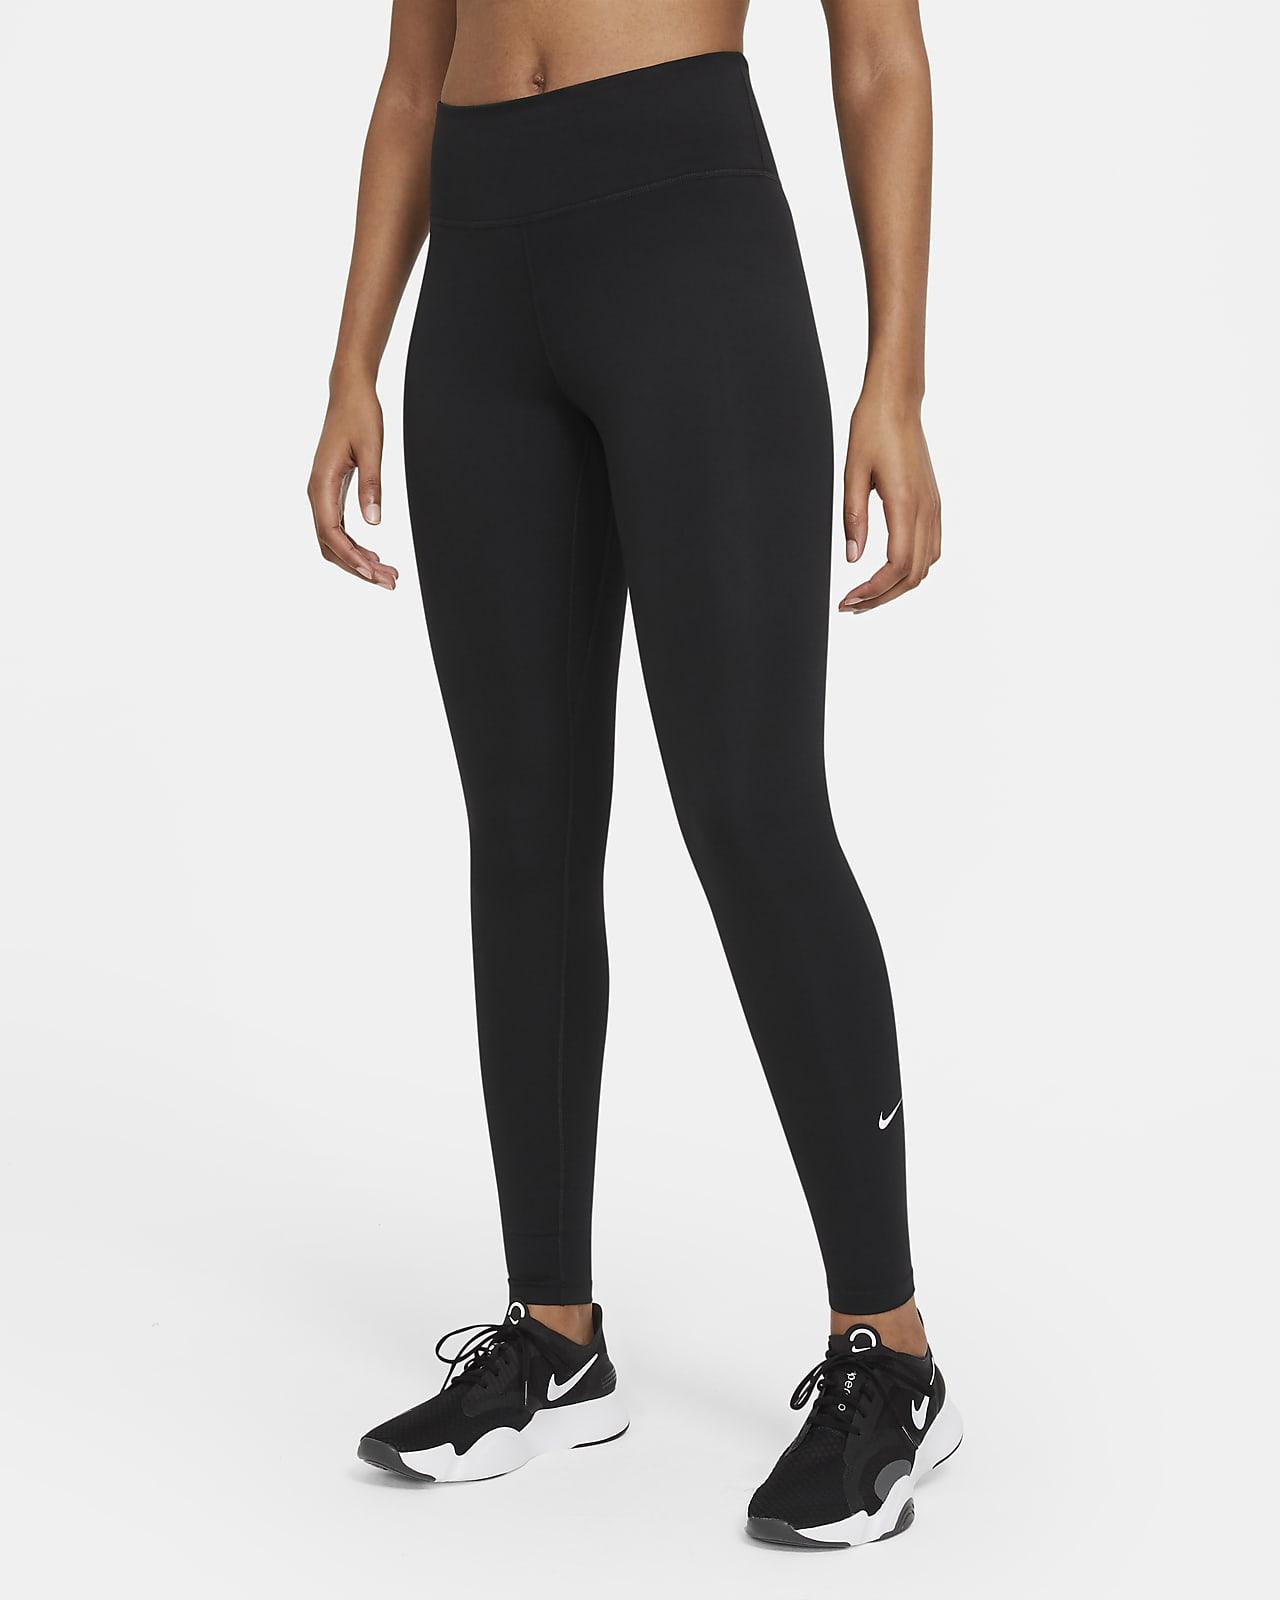 Nike Dri-FIT One középmagas derekú női leggings